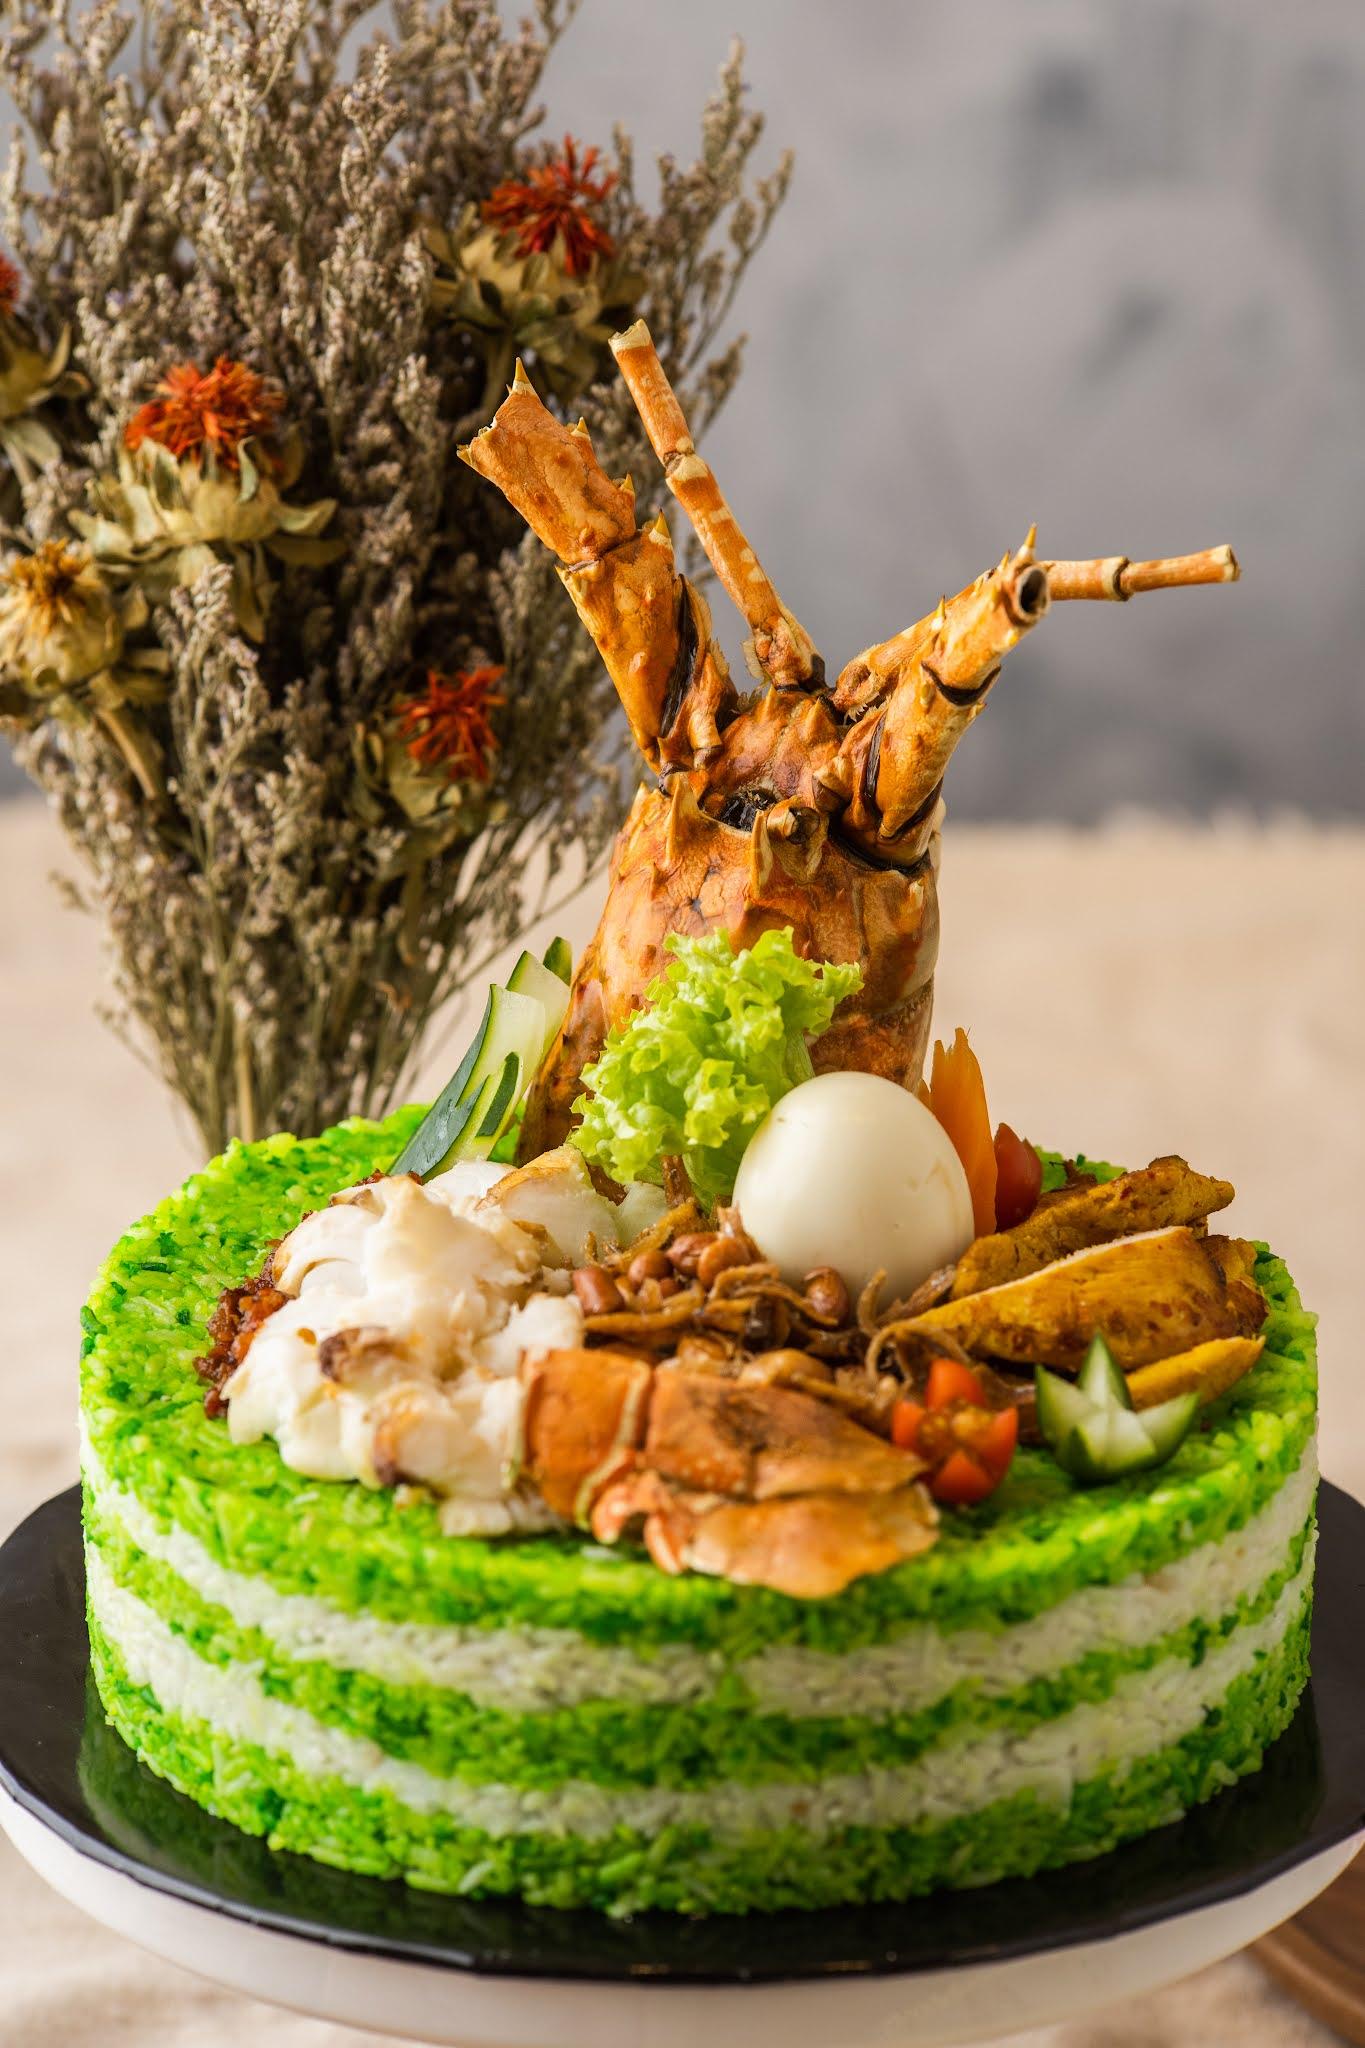 Perfect Match Catering: Unique savoury cakes, inspired by Malaysian favourites like nasi kerabu & briyani